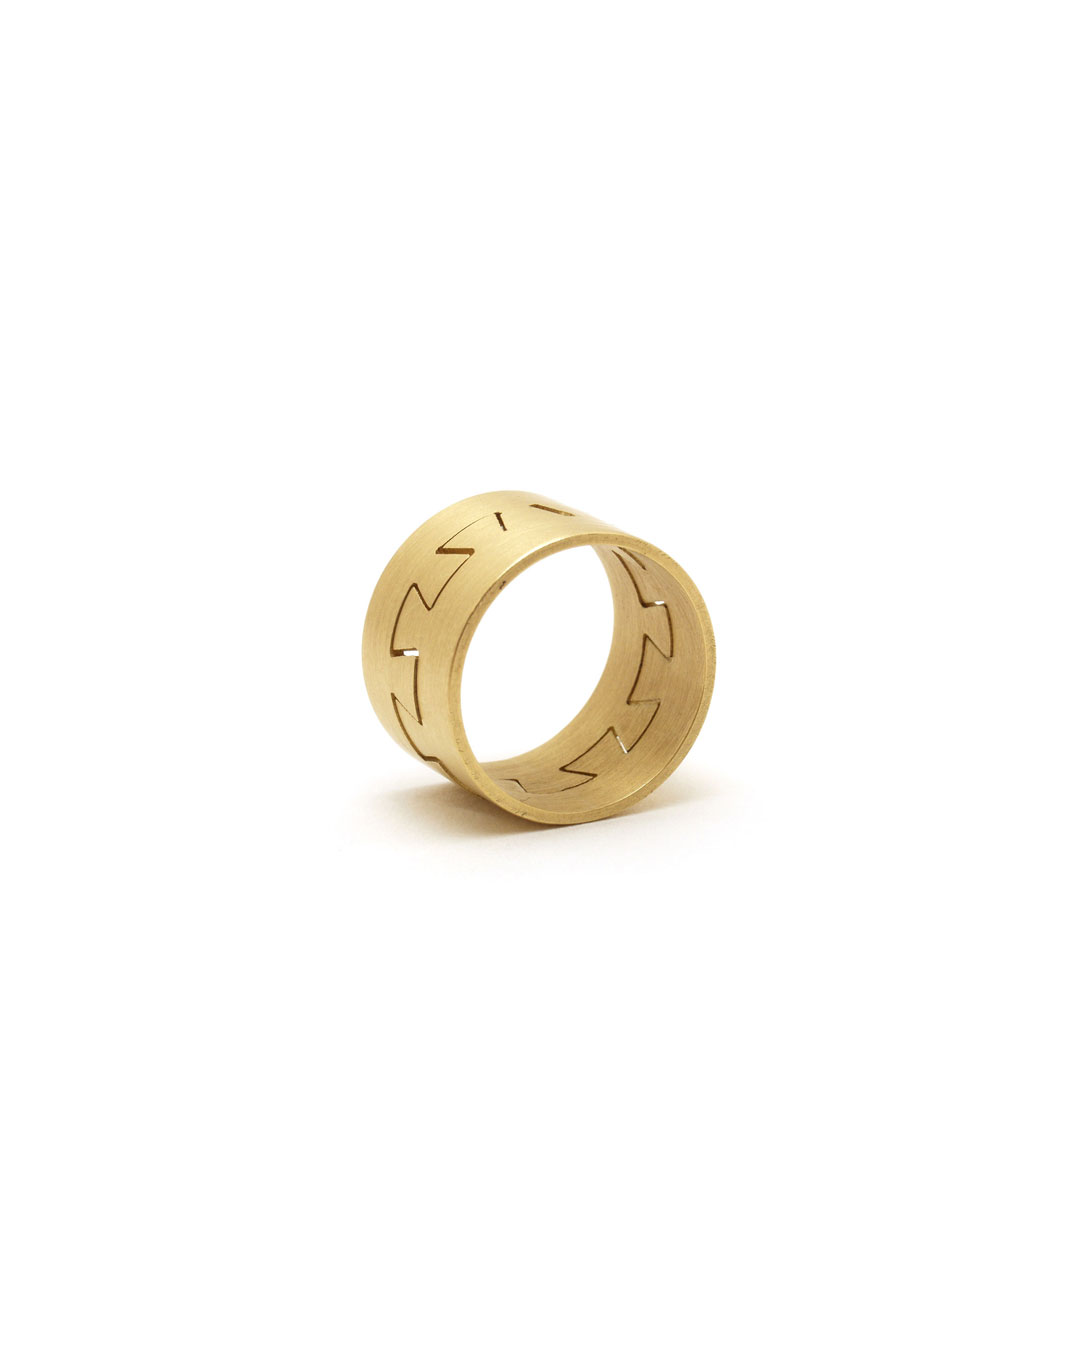 Herman Hermsen, Meanderring, 1995, ring; 18ct gold, ø 25 mm, €1250